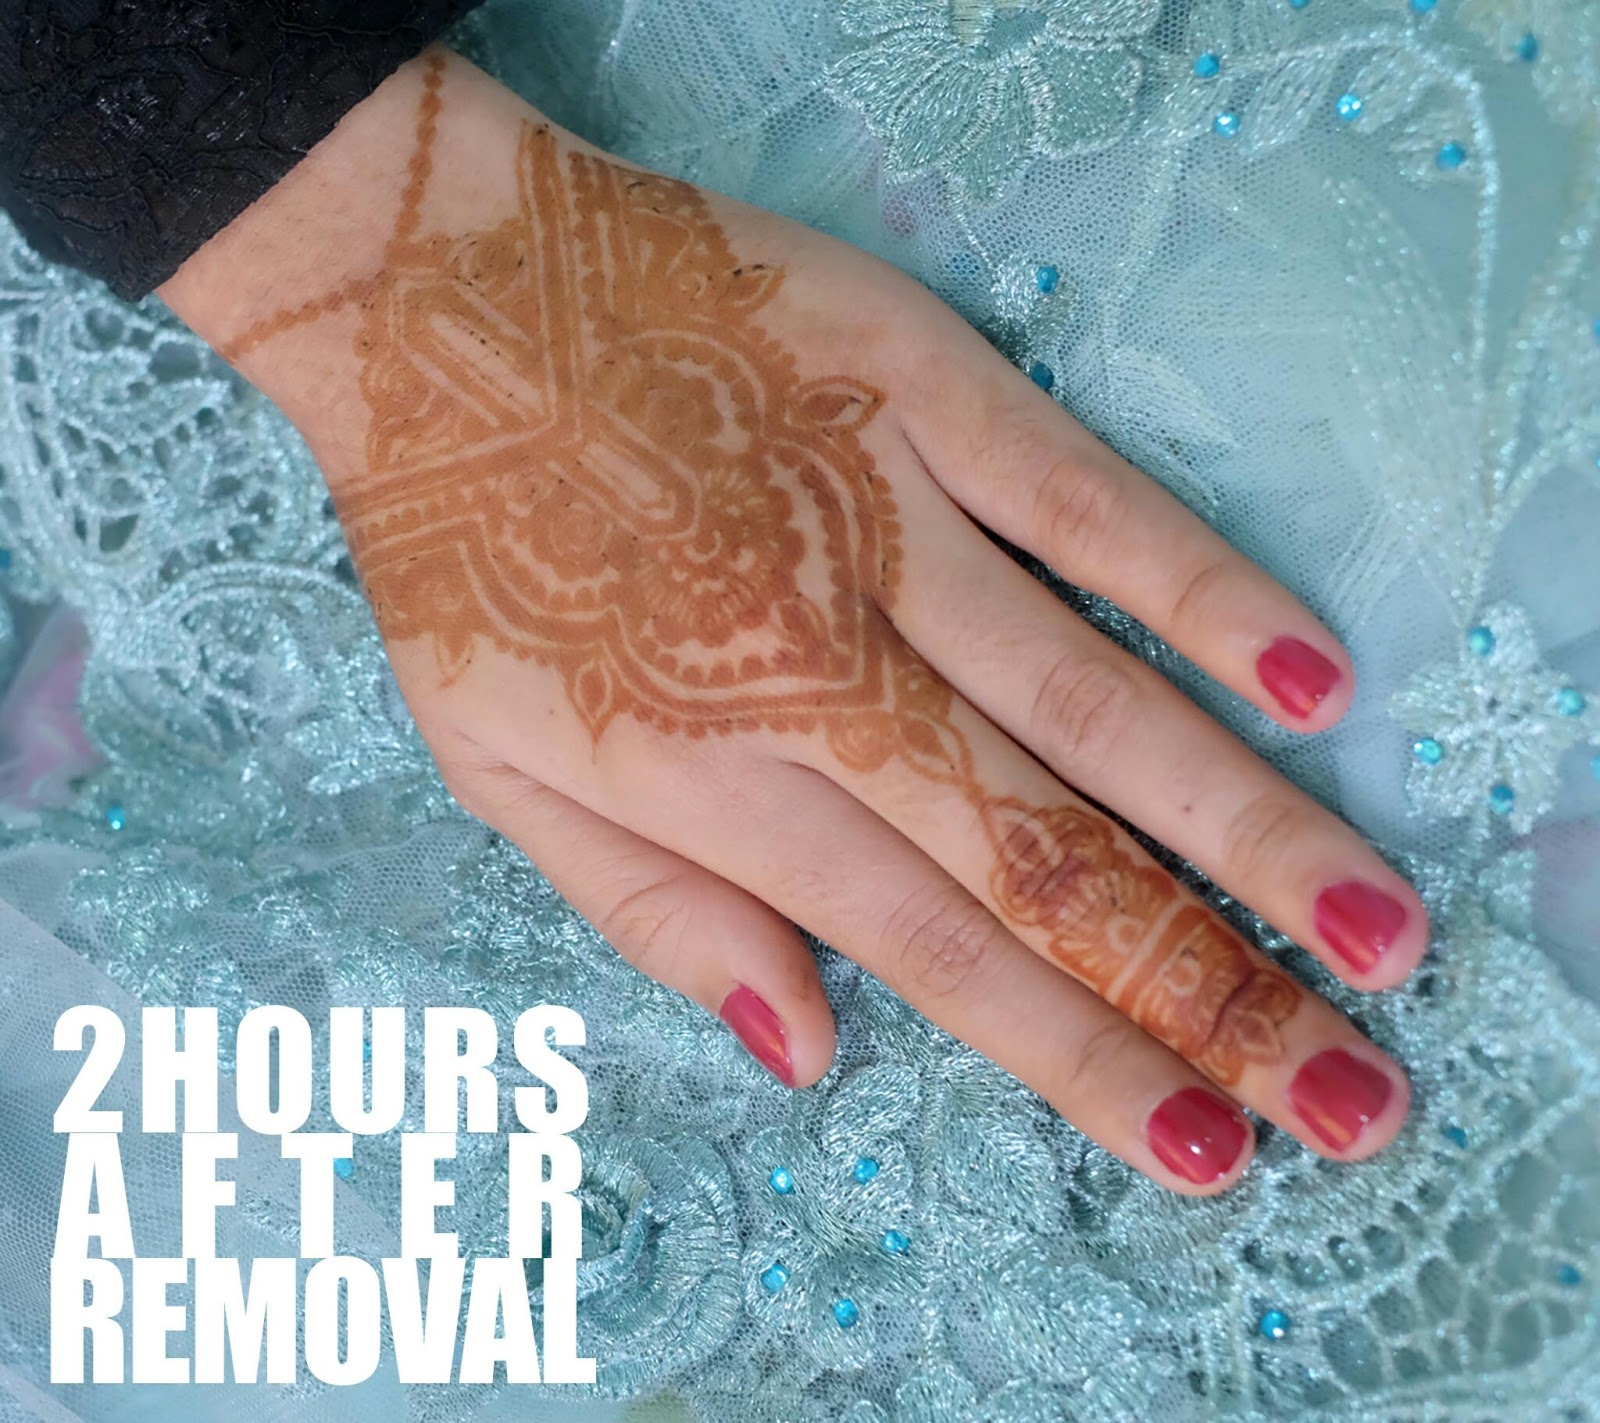 Koleksi Henna Gagal 2017  Teknik Menggambar Henna atau Inai